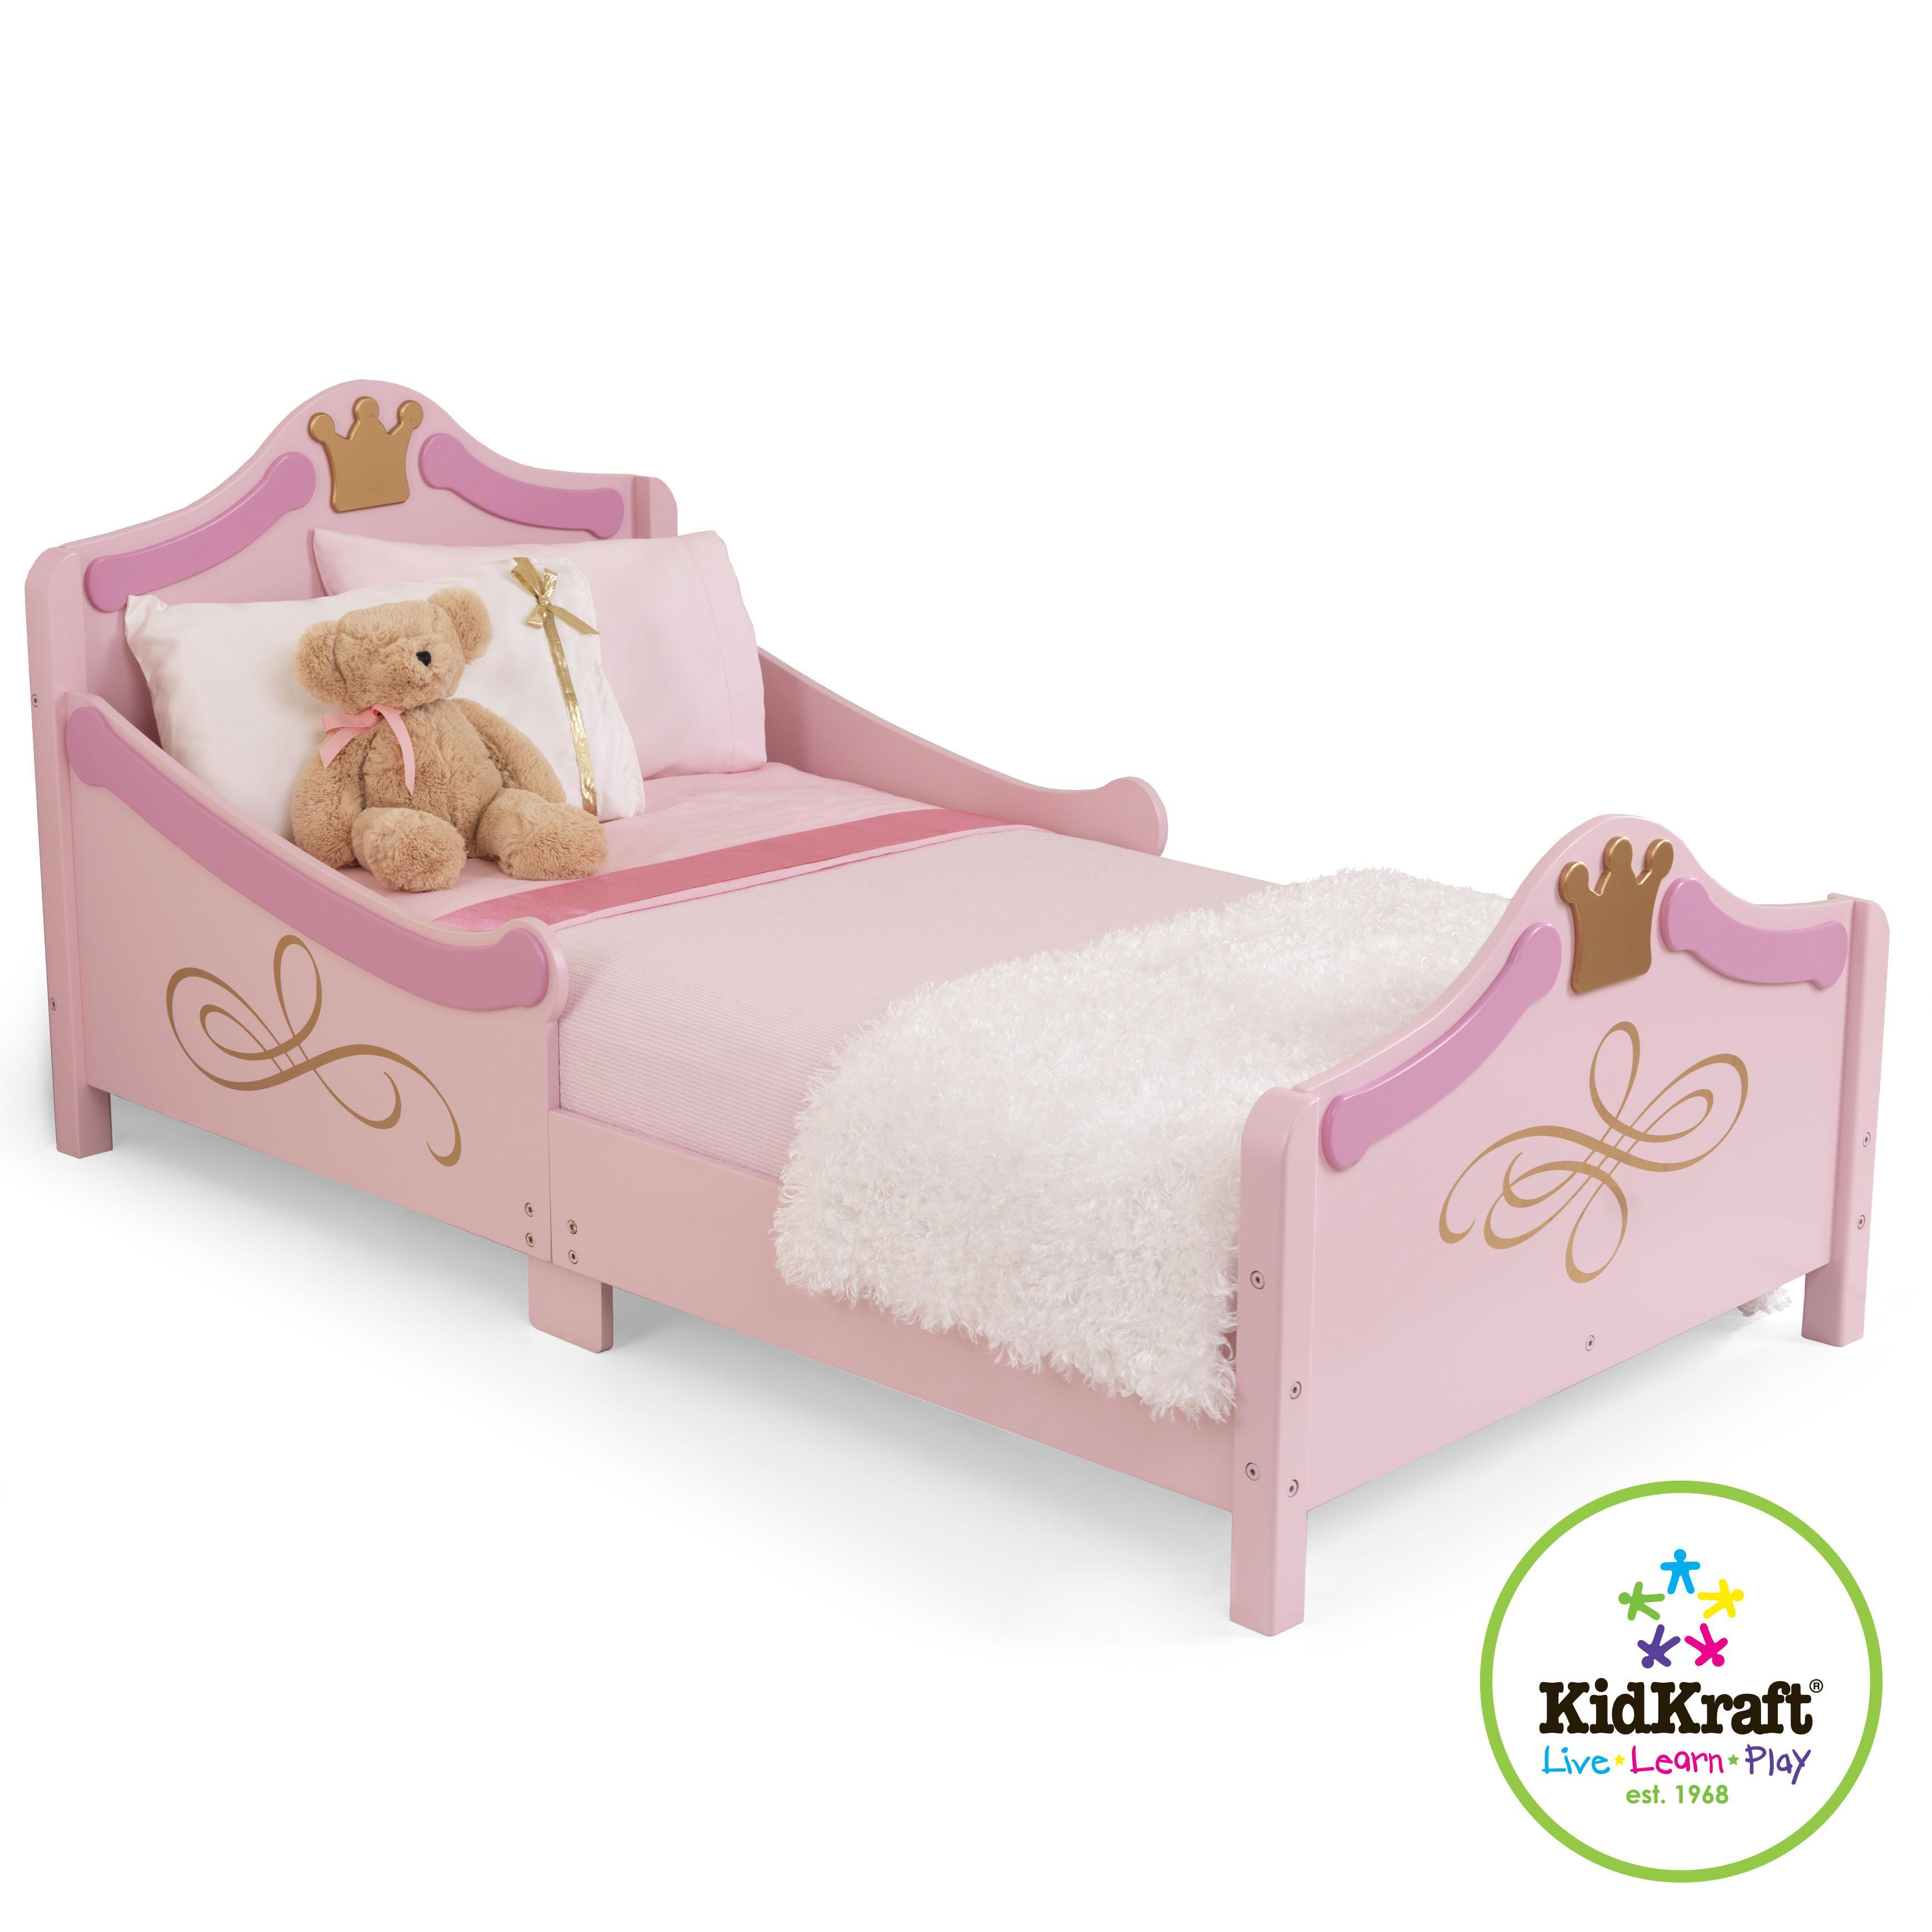 Kidkraft cama estilo princesa 76139 hogar - Cama princesa nina ...